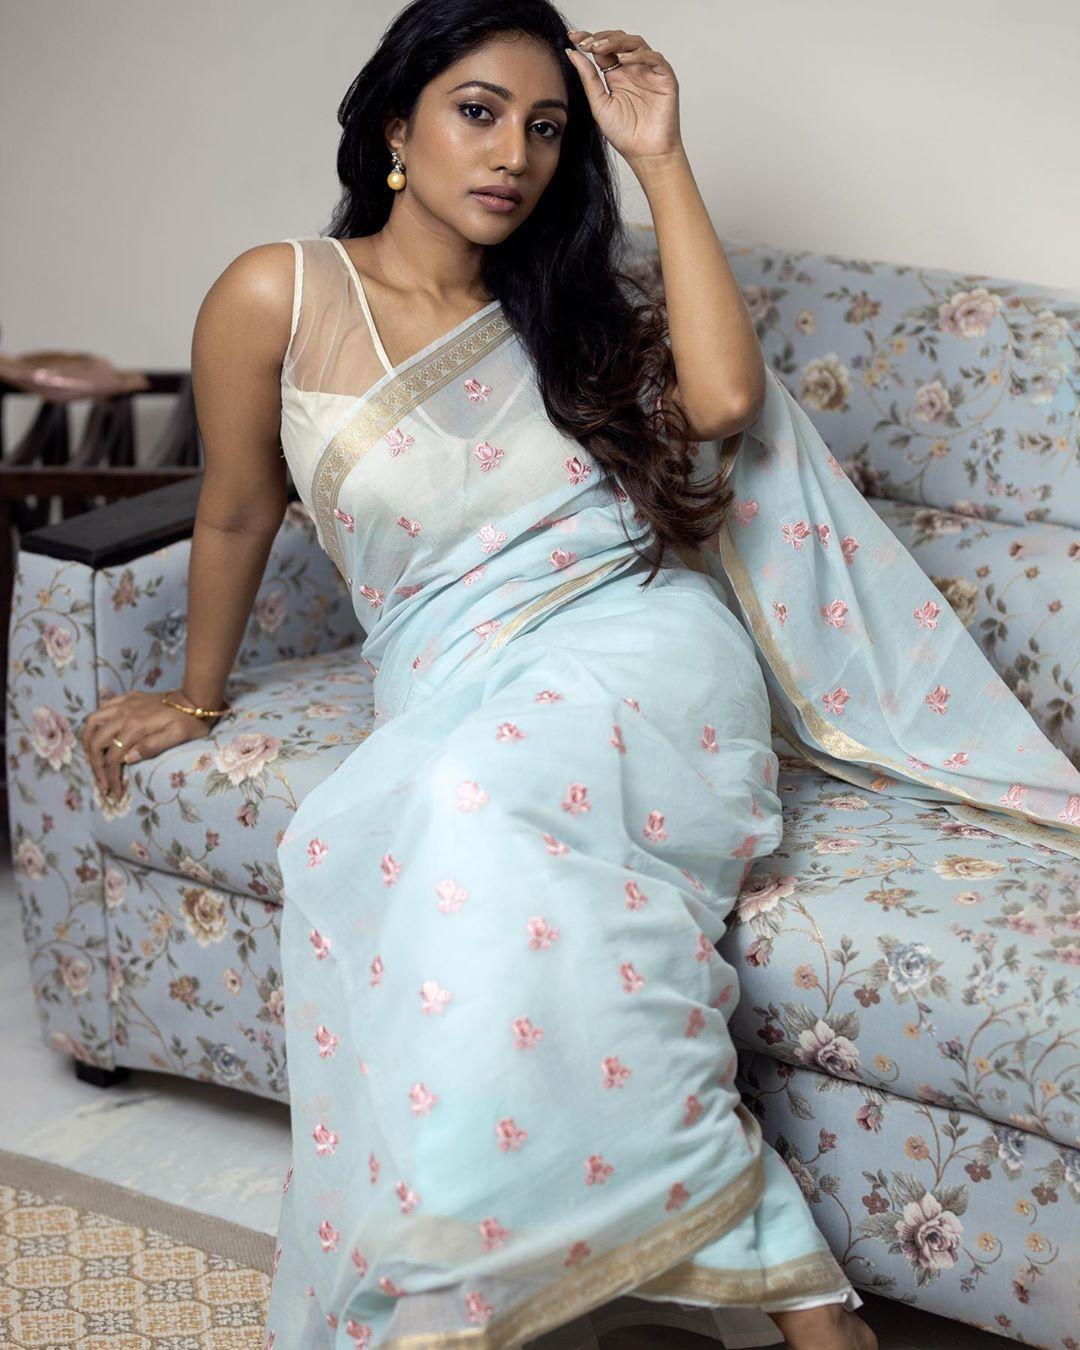 Bommu Lakshmi photos (50)